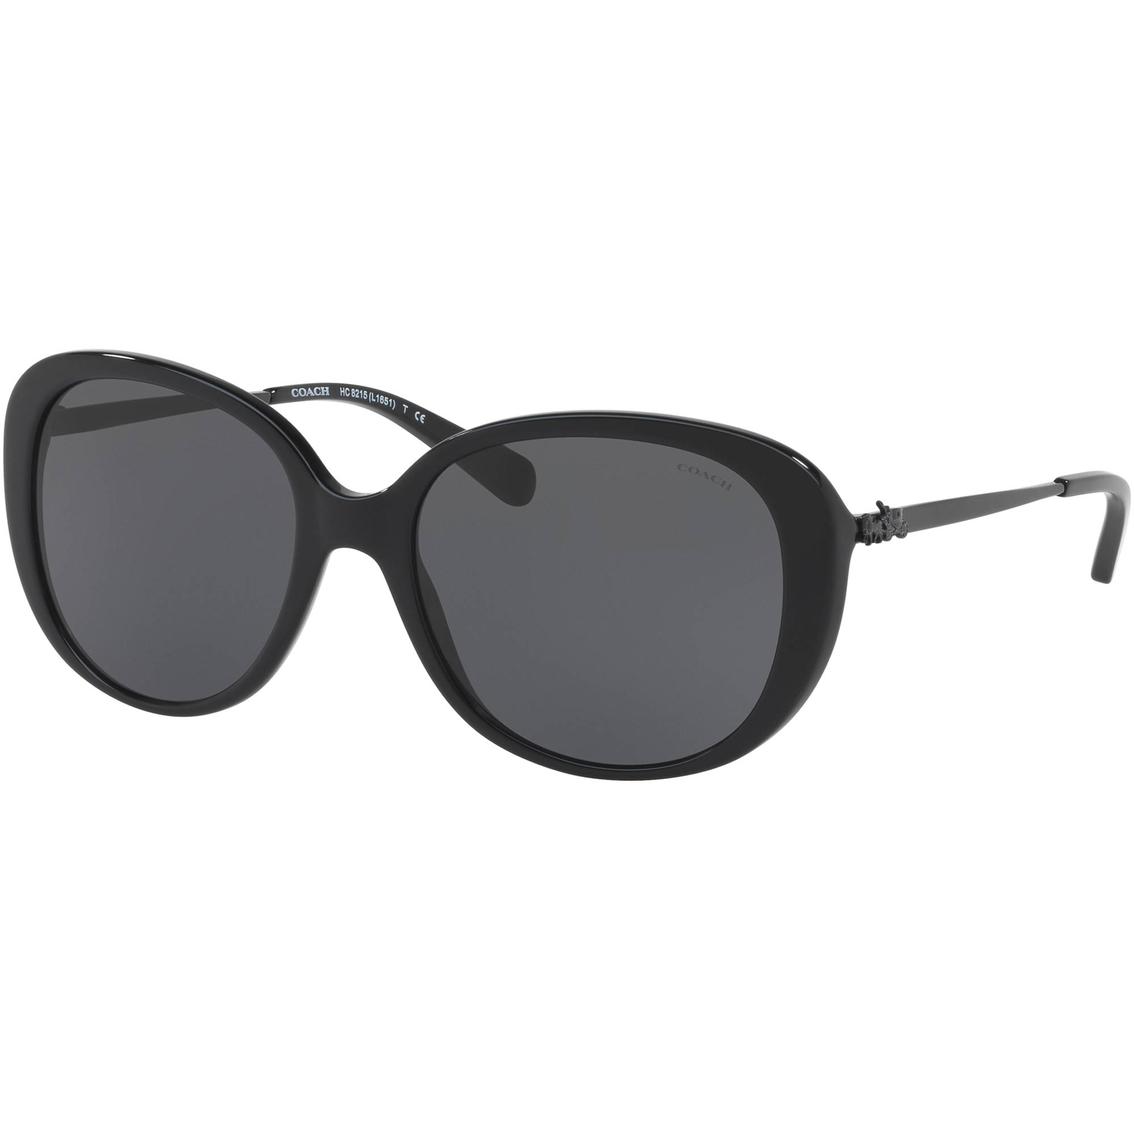 2914efc672ff Coach Round Sunglasses 0hc8215 | Women's Sunglasses | Handbags ...